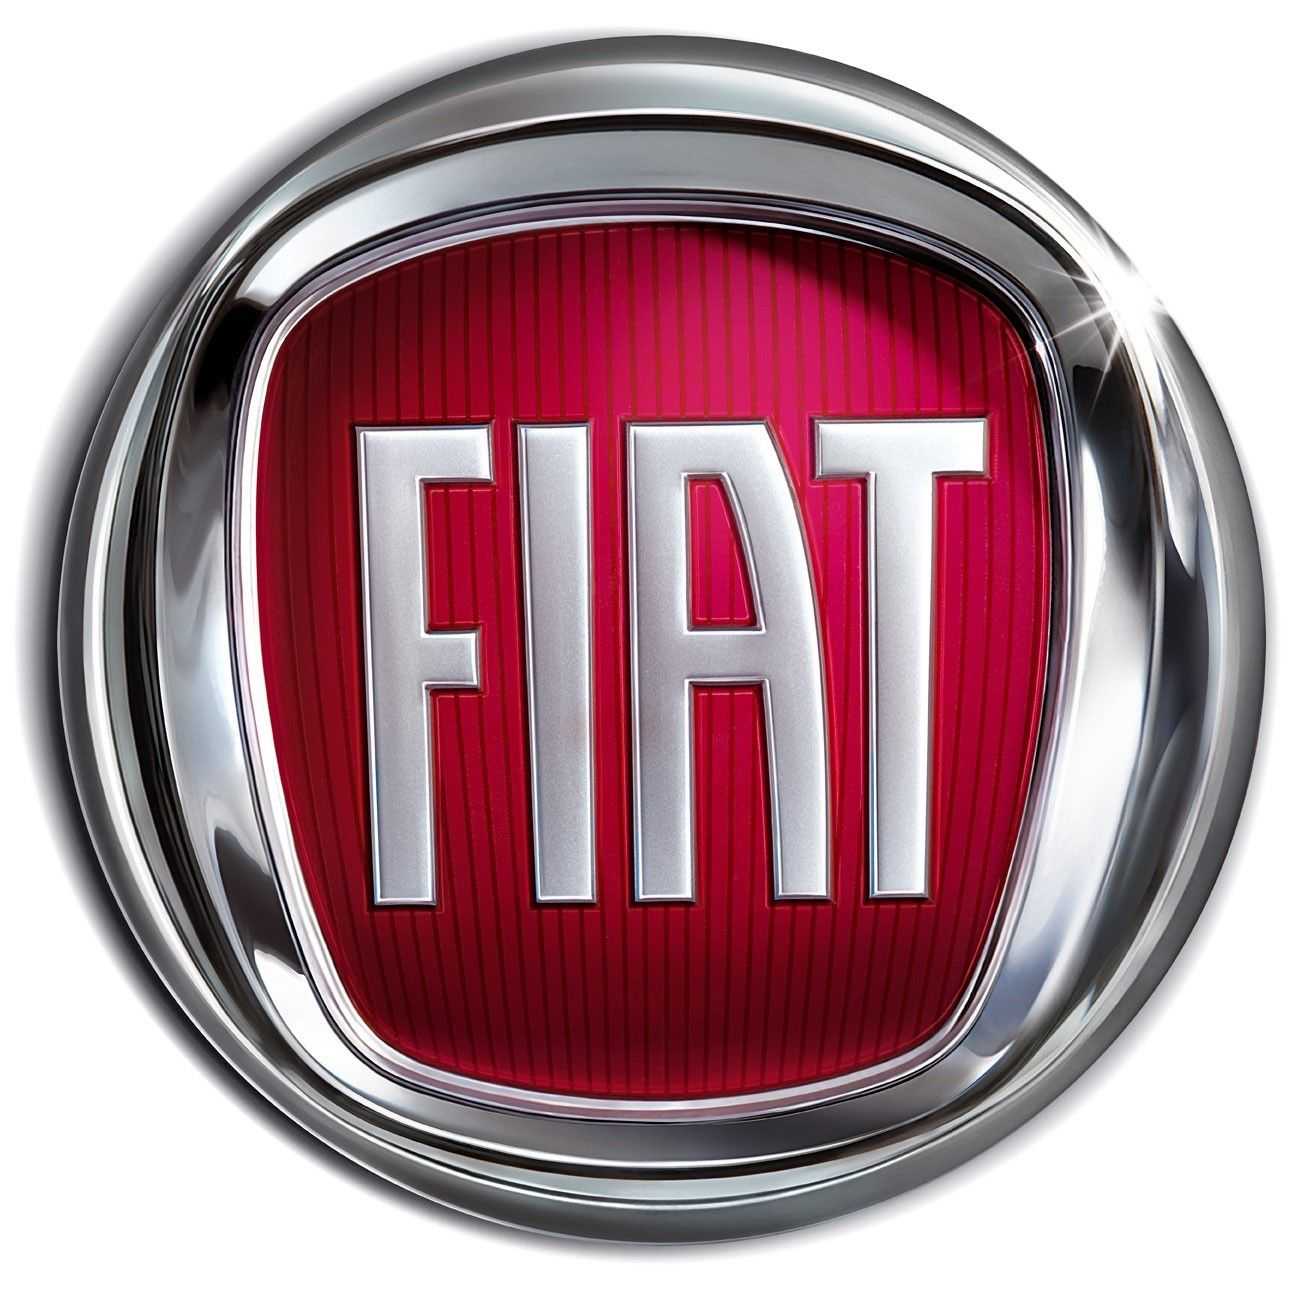 Fiat Marca Italiana De Automóviles Su Acrónimo Fabbrica - Car signs and namescar logos with wings azs cars